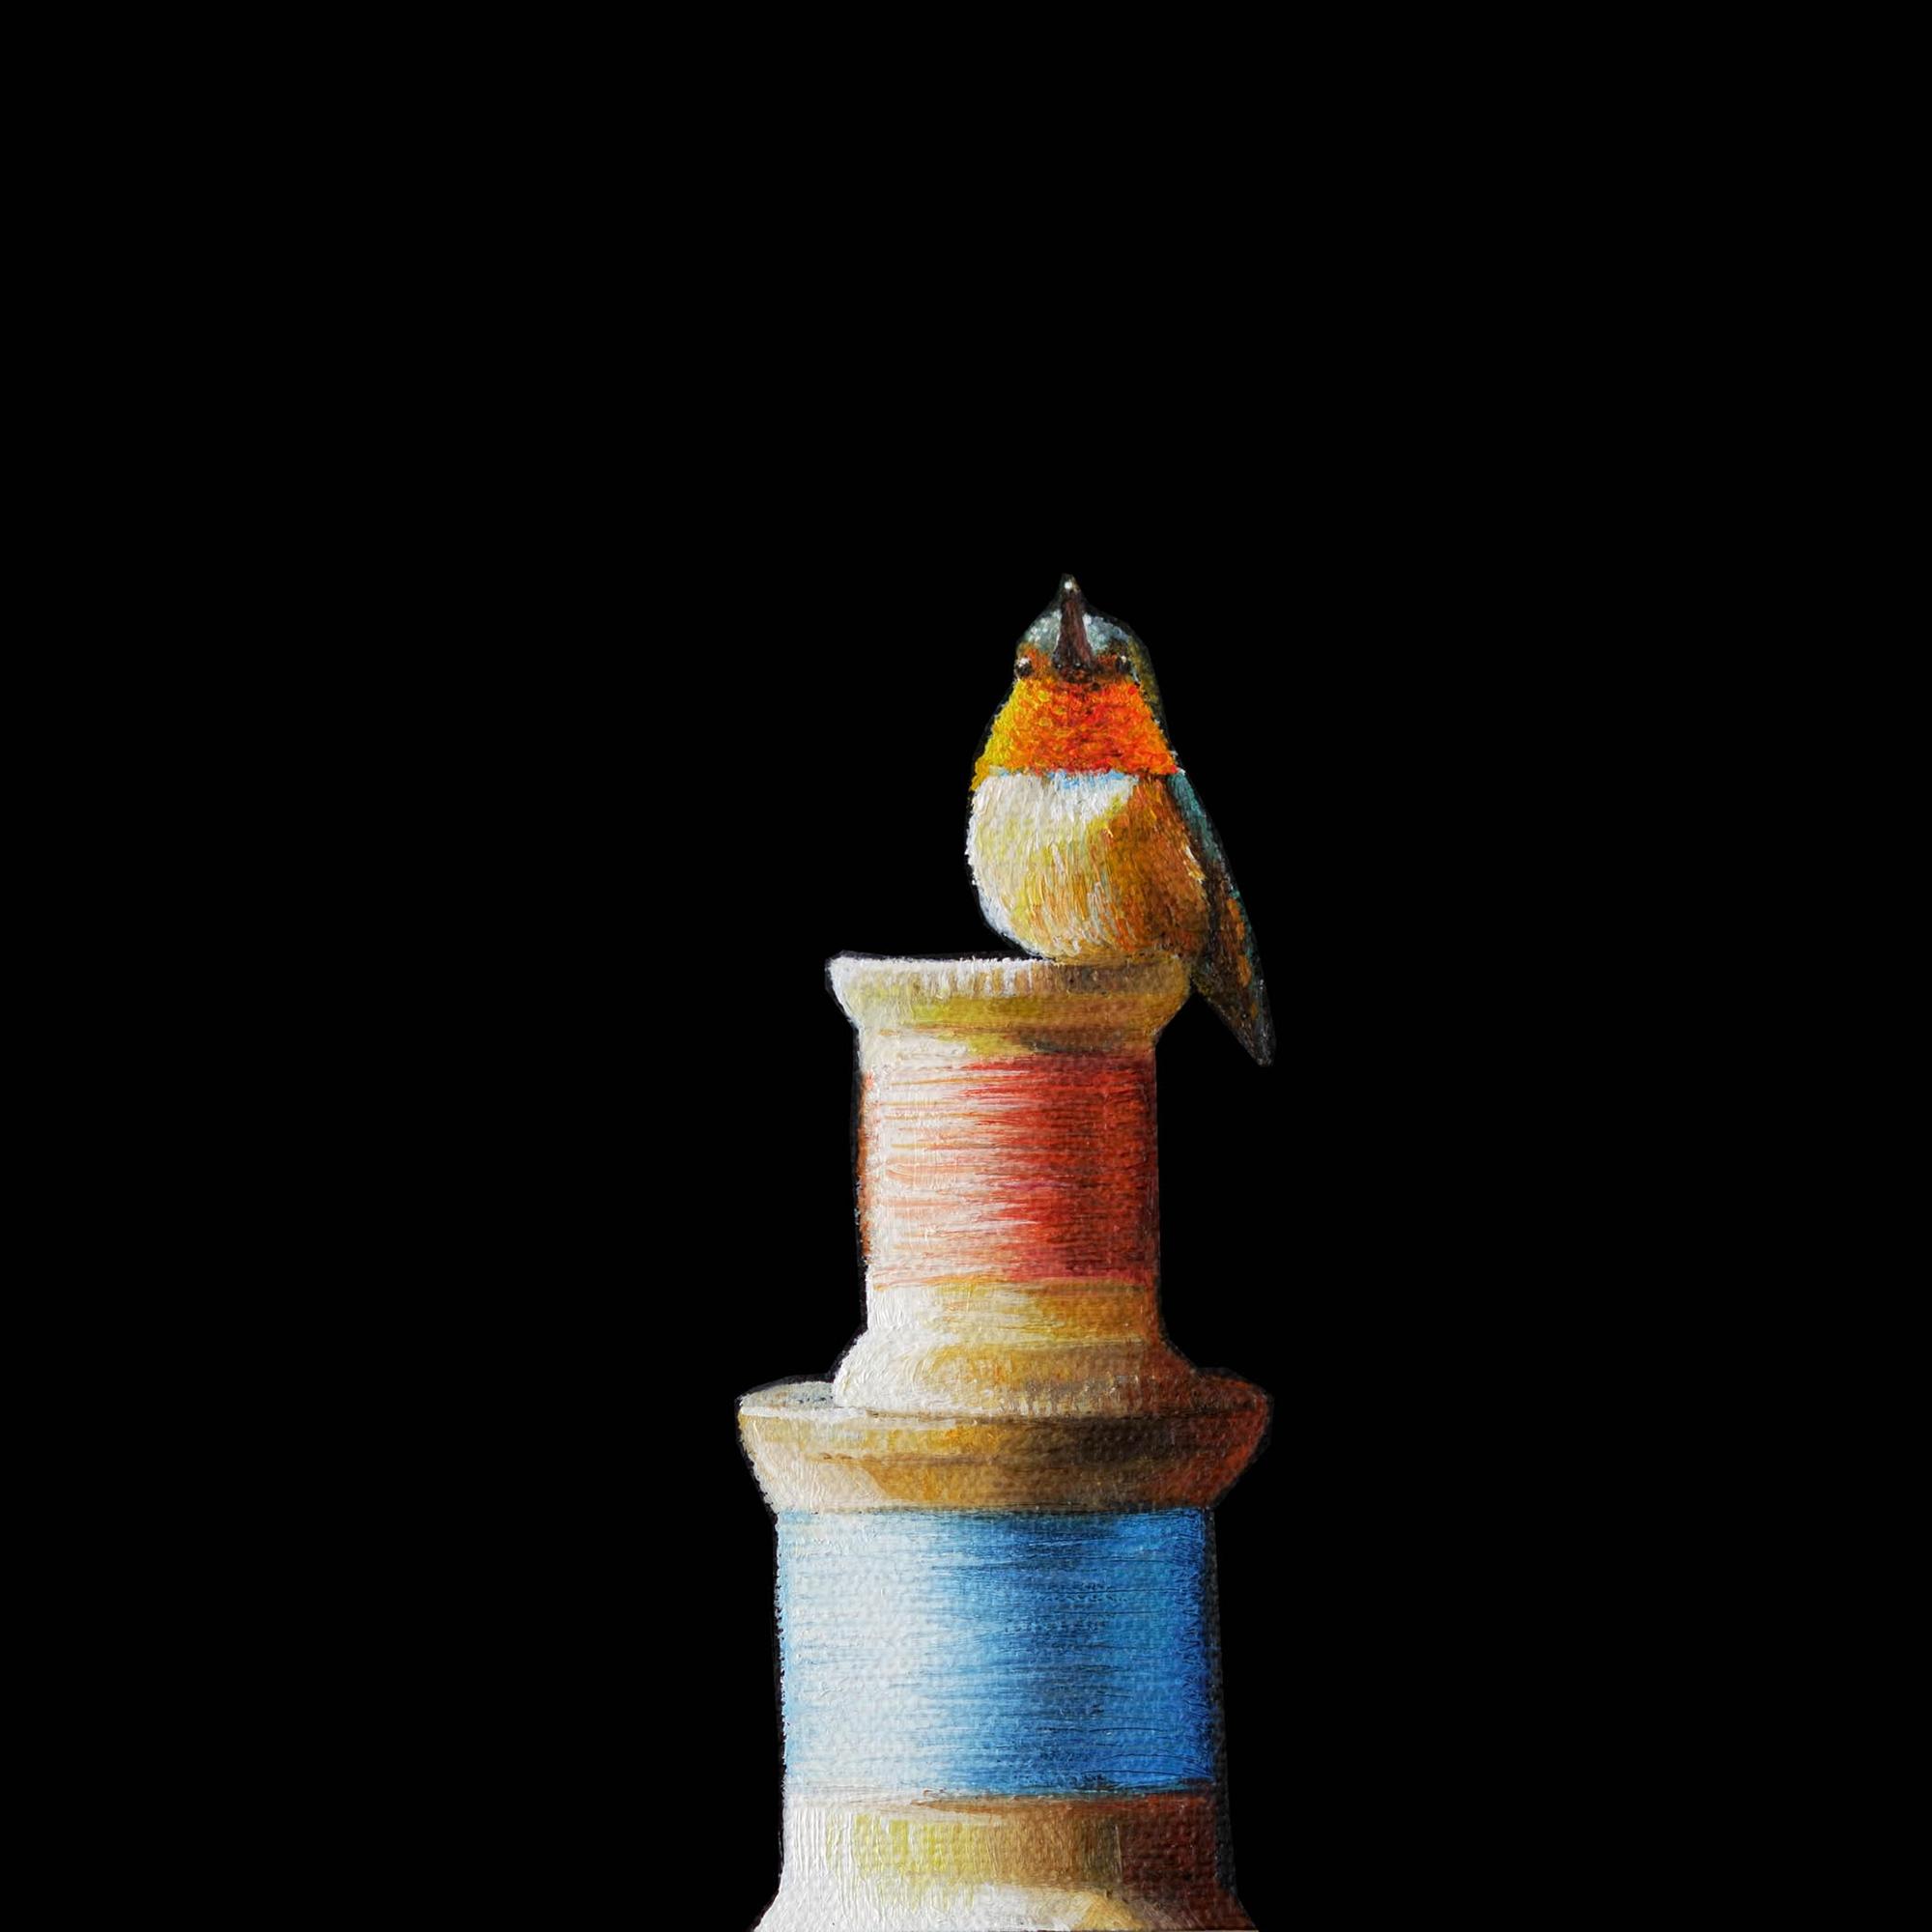 Thread | 7 x 7 | Oil on canvas | SOLD